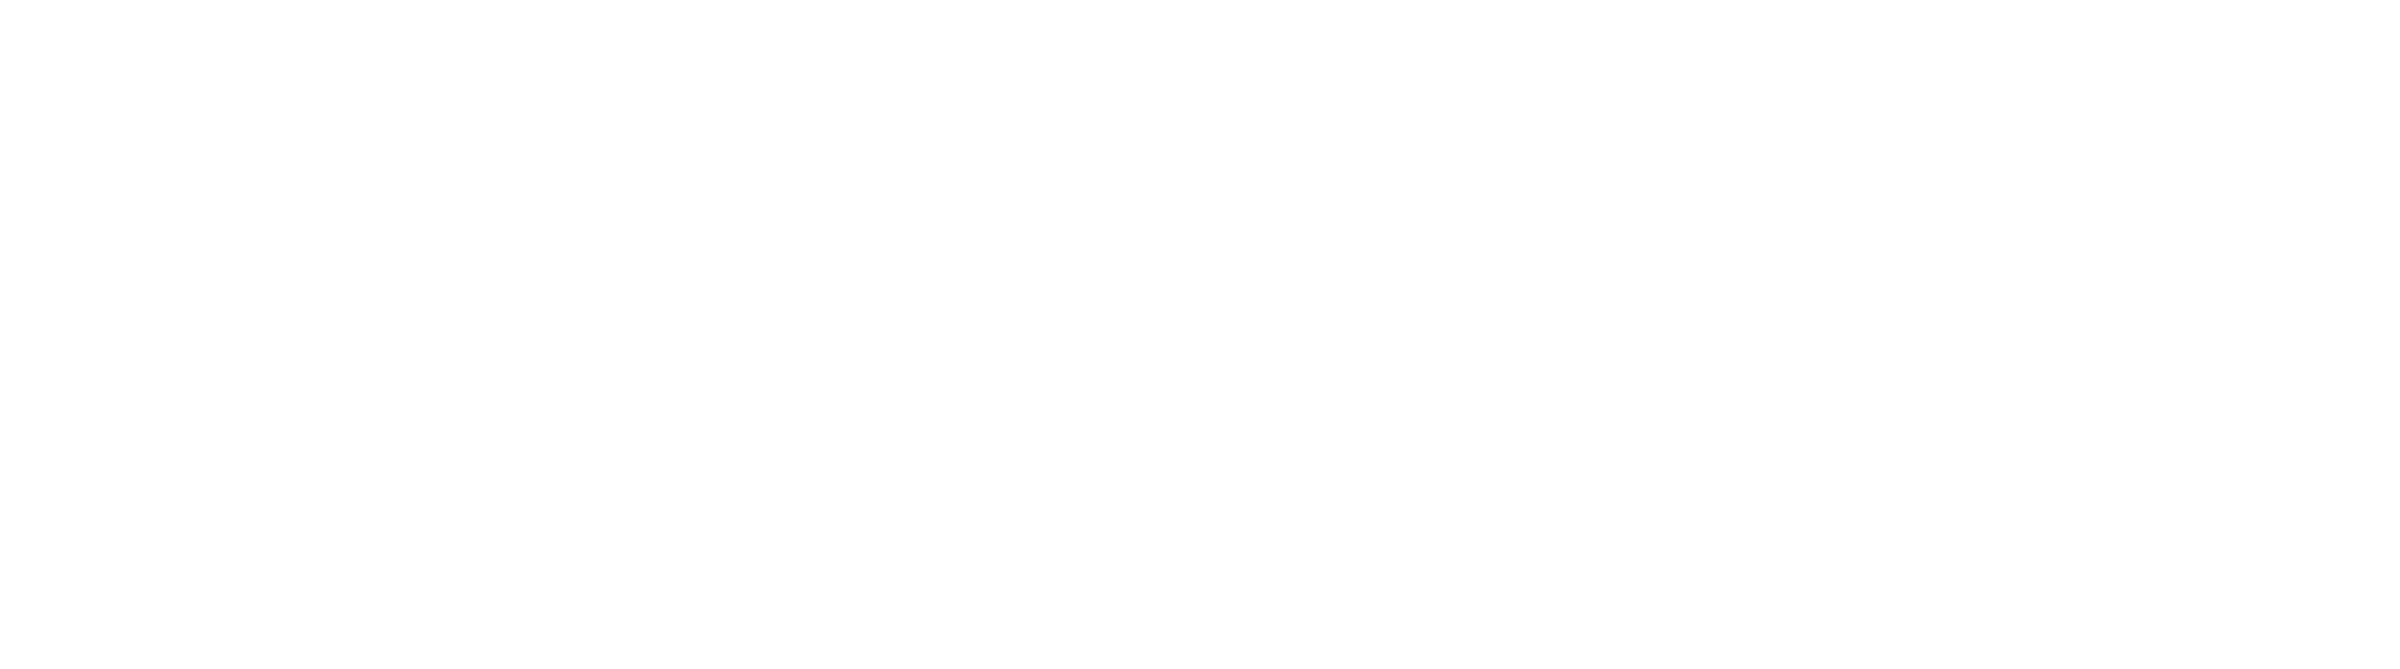 fullstop. Logo